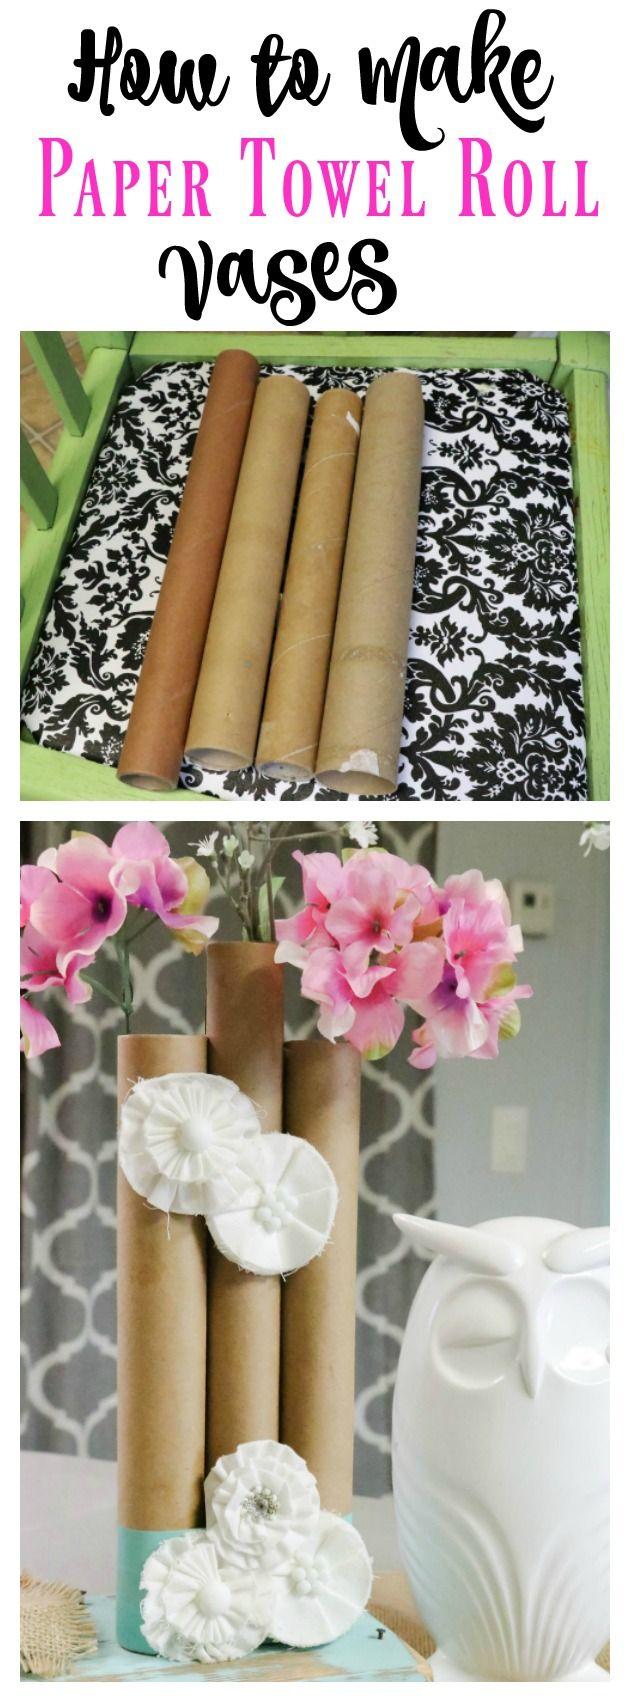 Paper Towel Roll Vases Paper towel rolls, Paper towel